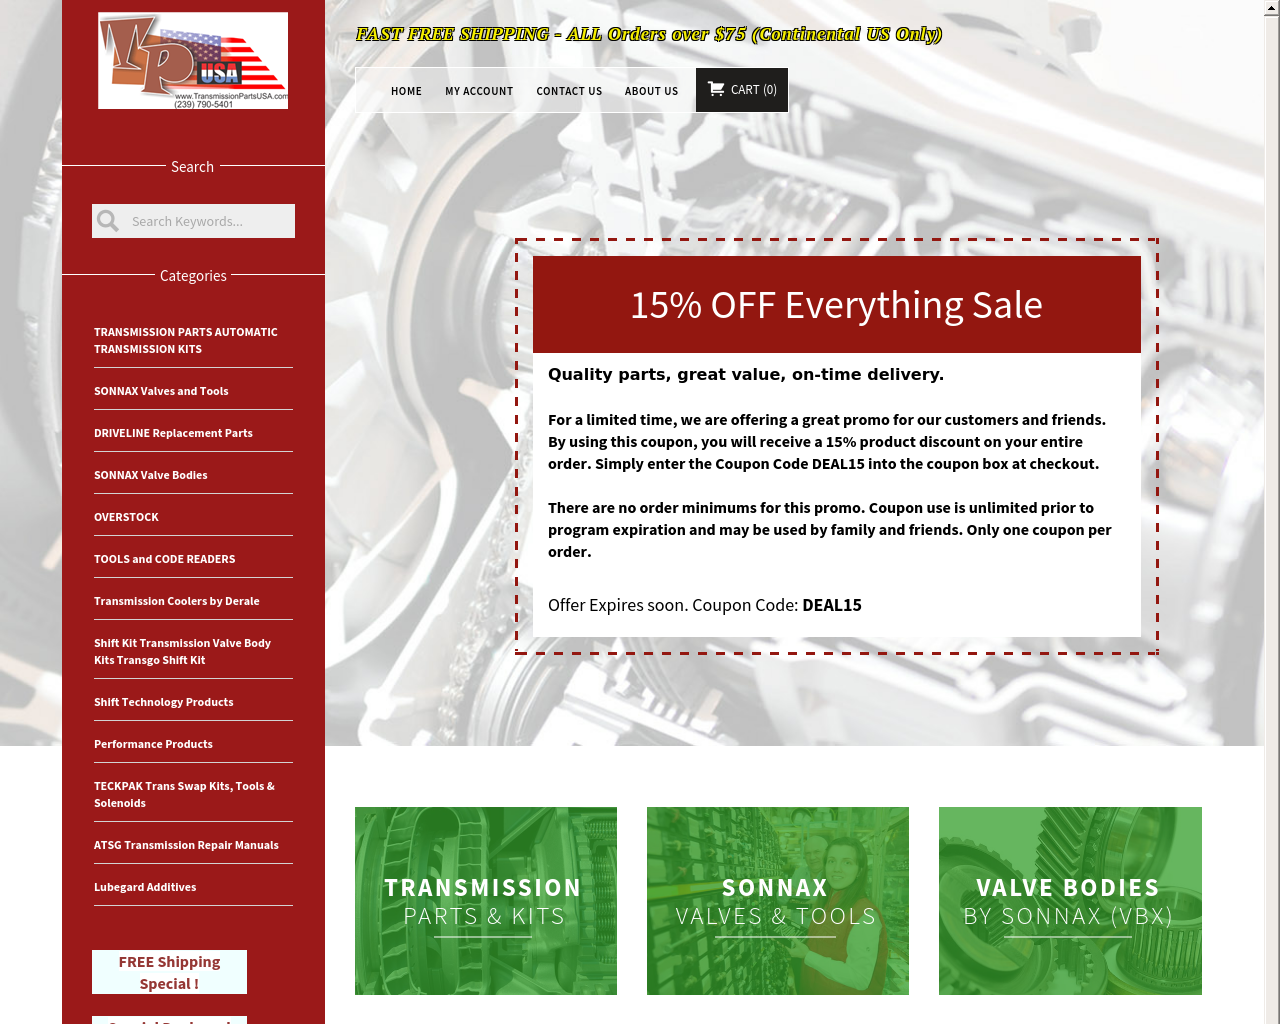 TransmissionPartsUSA-Advertising-Reviews-Pricing